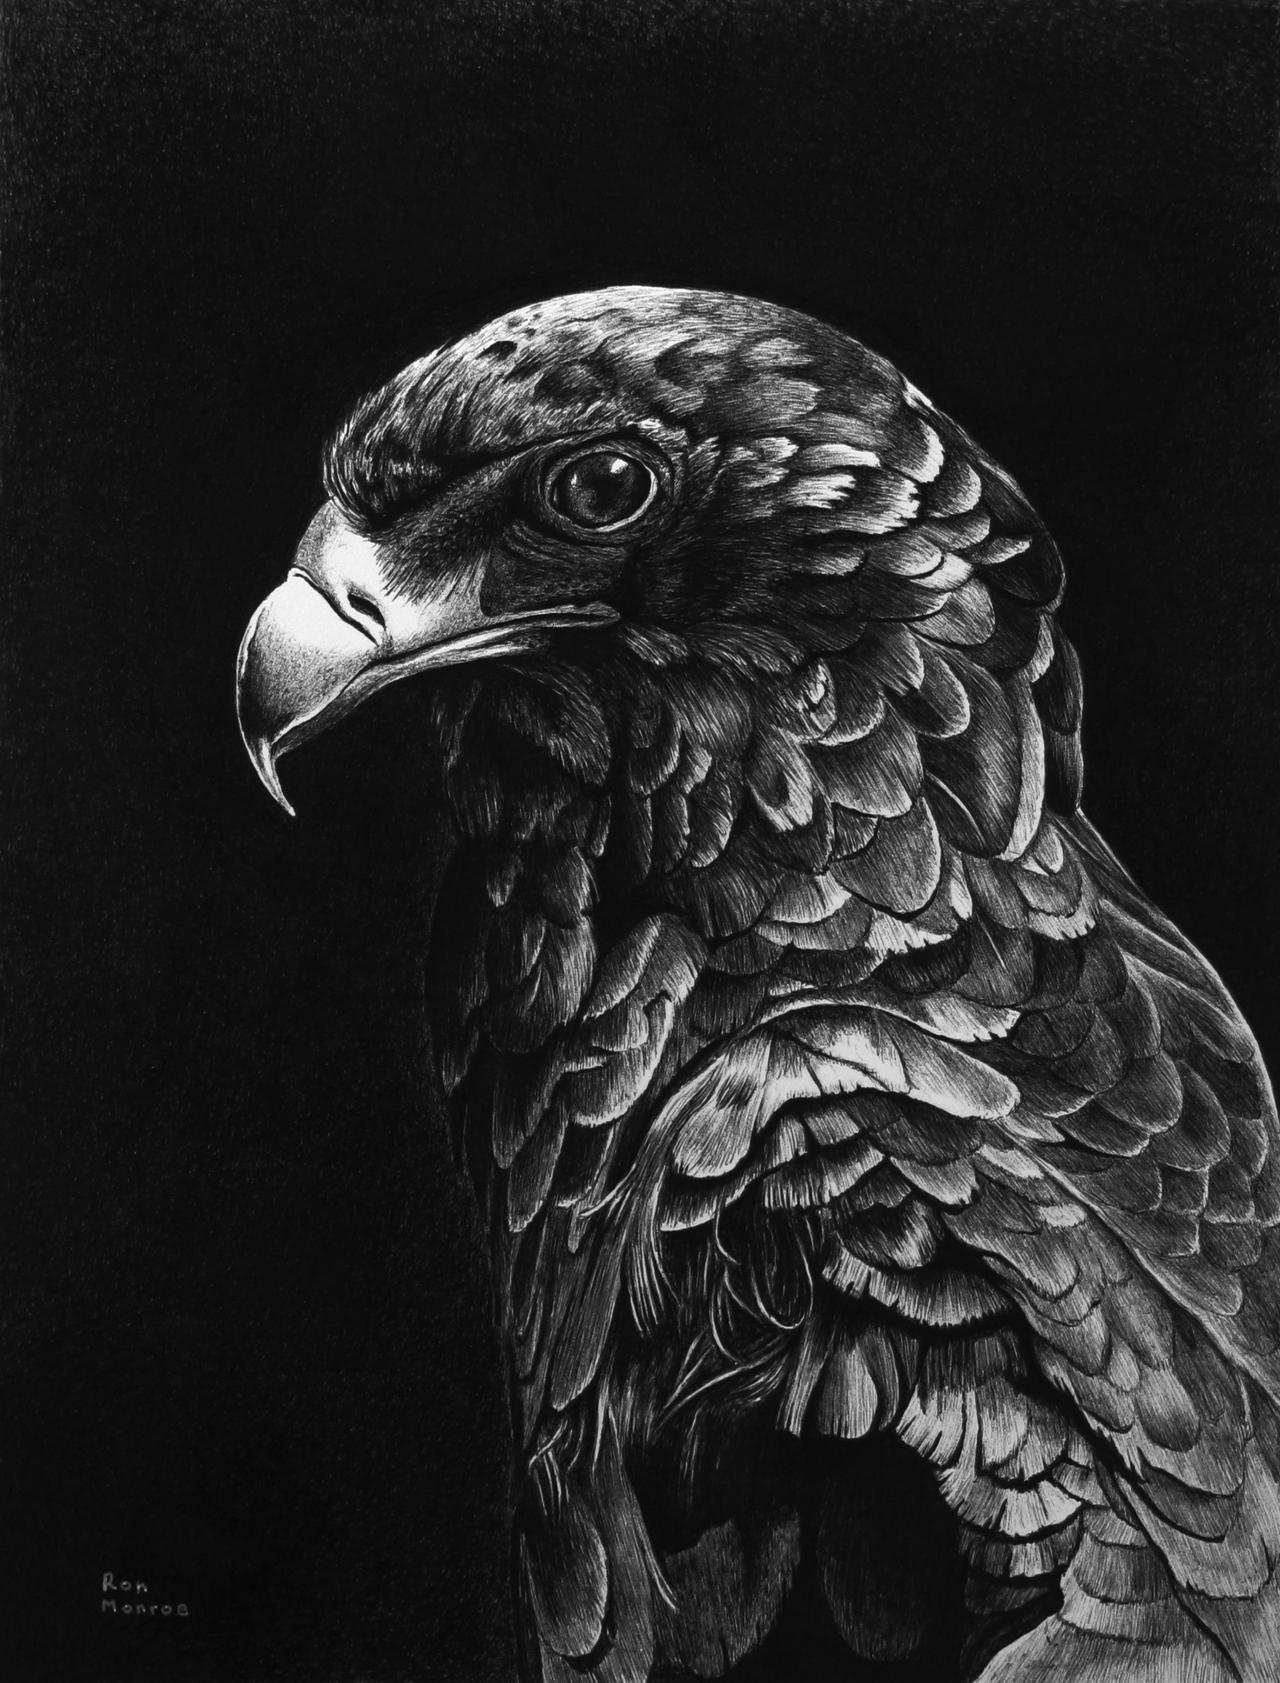 Bateleur Eagle in Ballpoint Pen